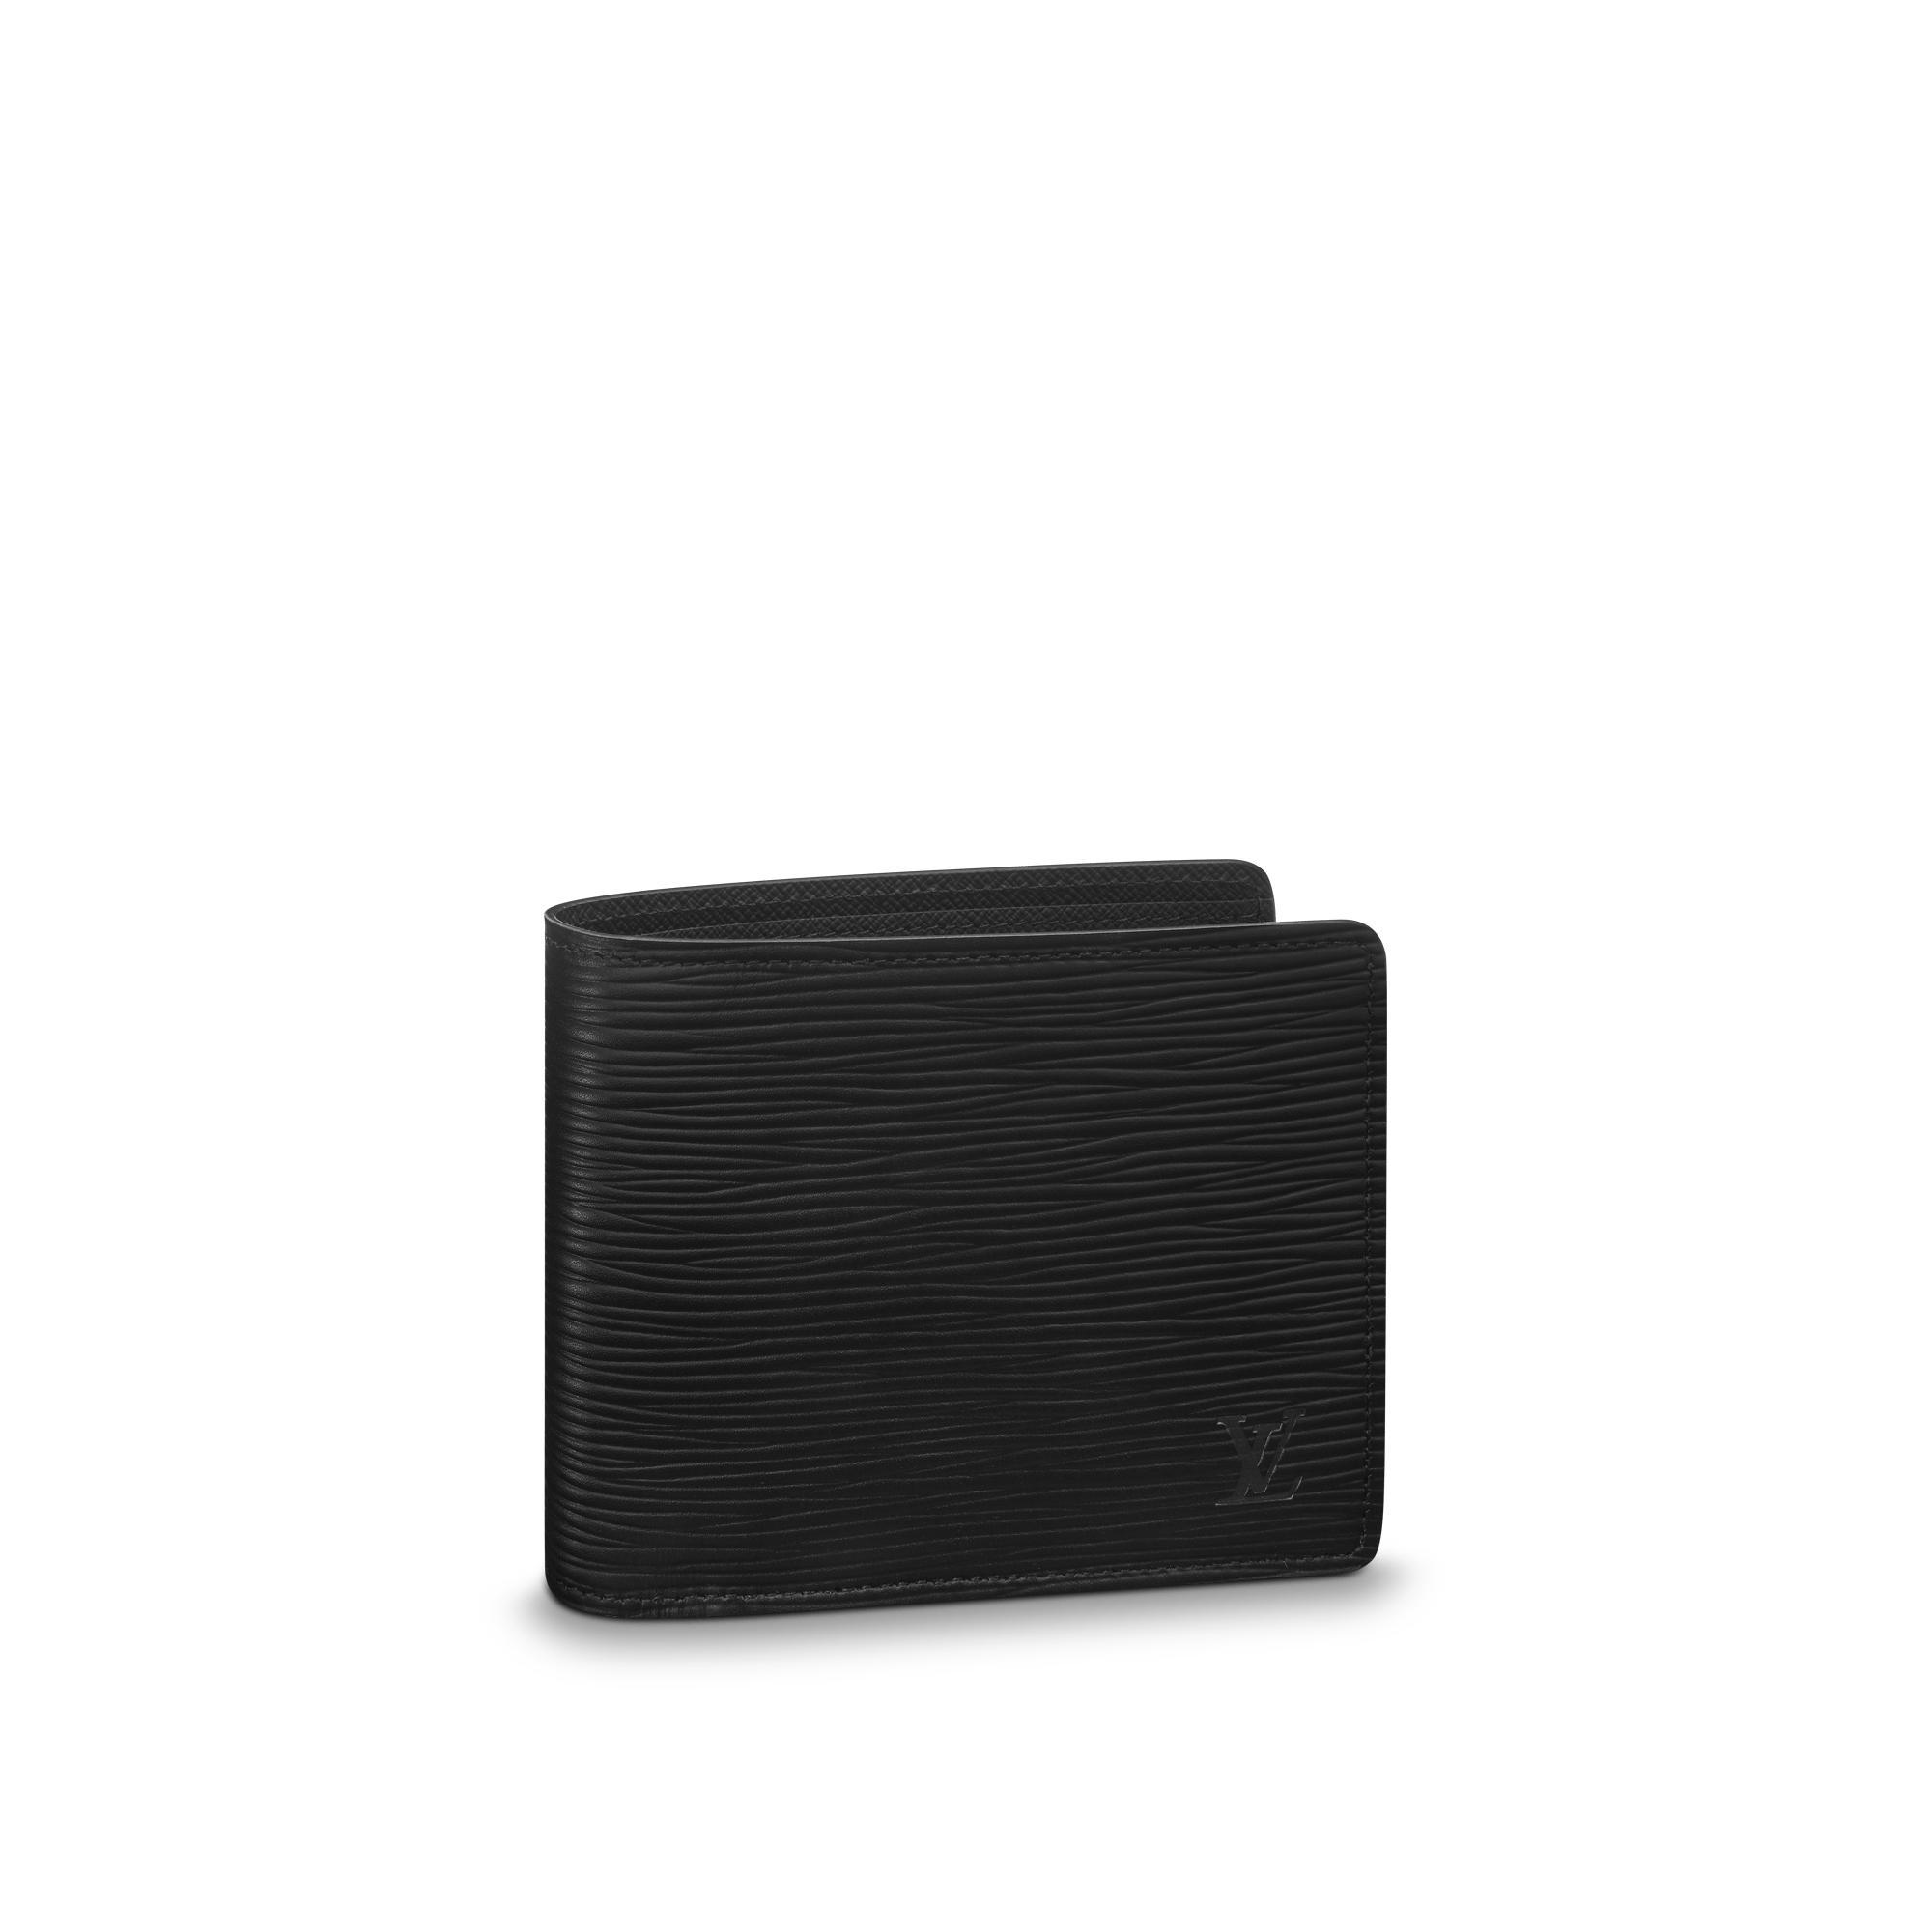 8879bb35328e Louis Vuitton Multiple Wallet In Noir